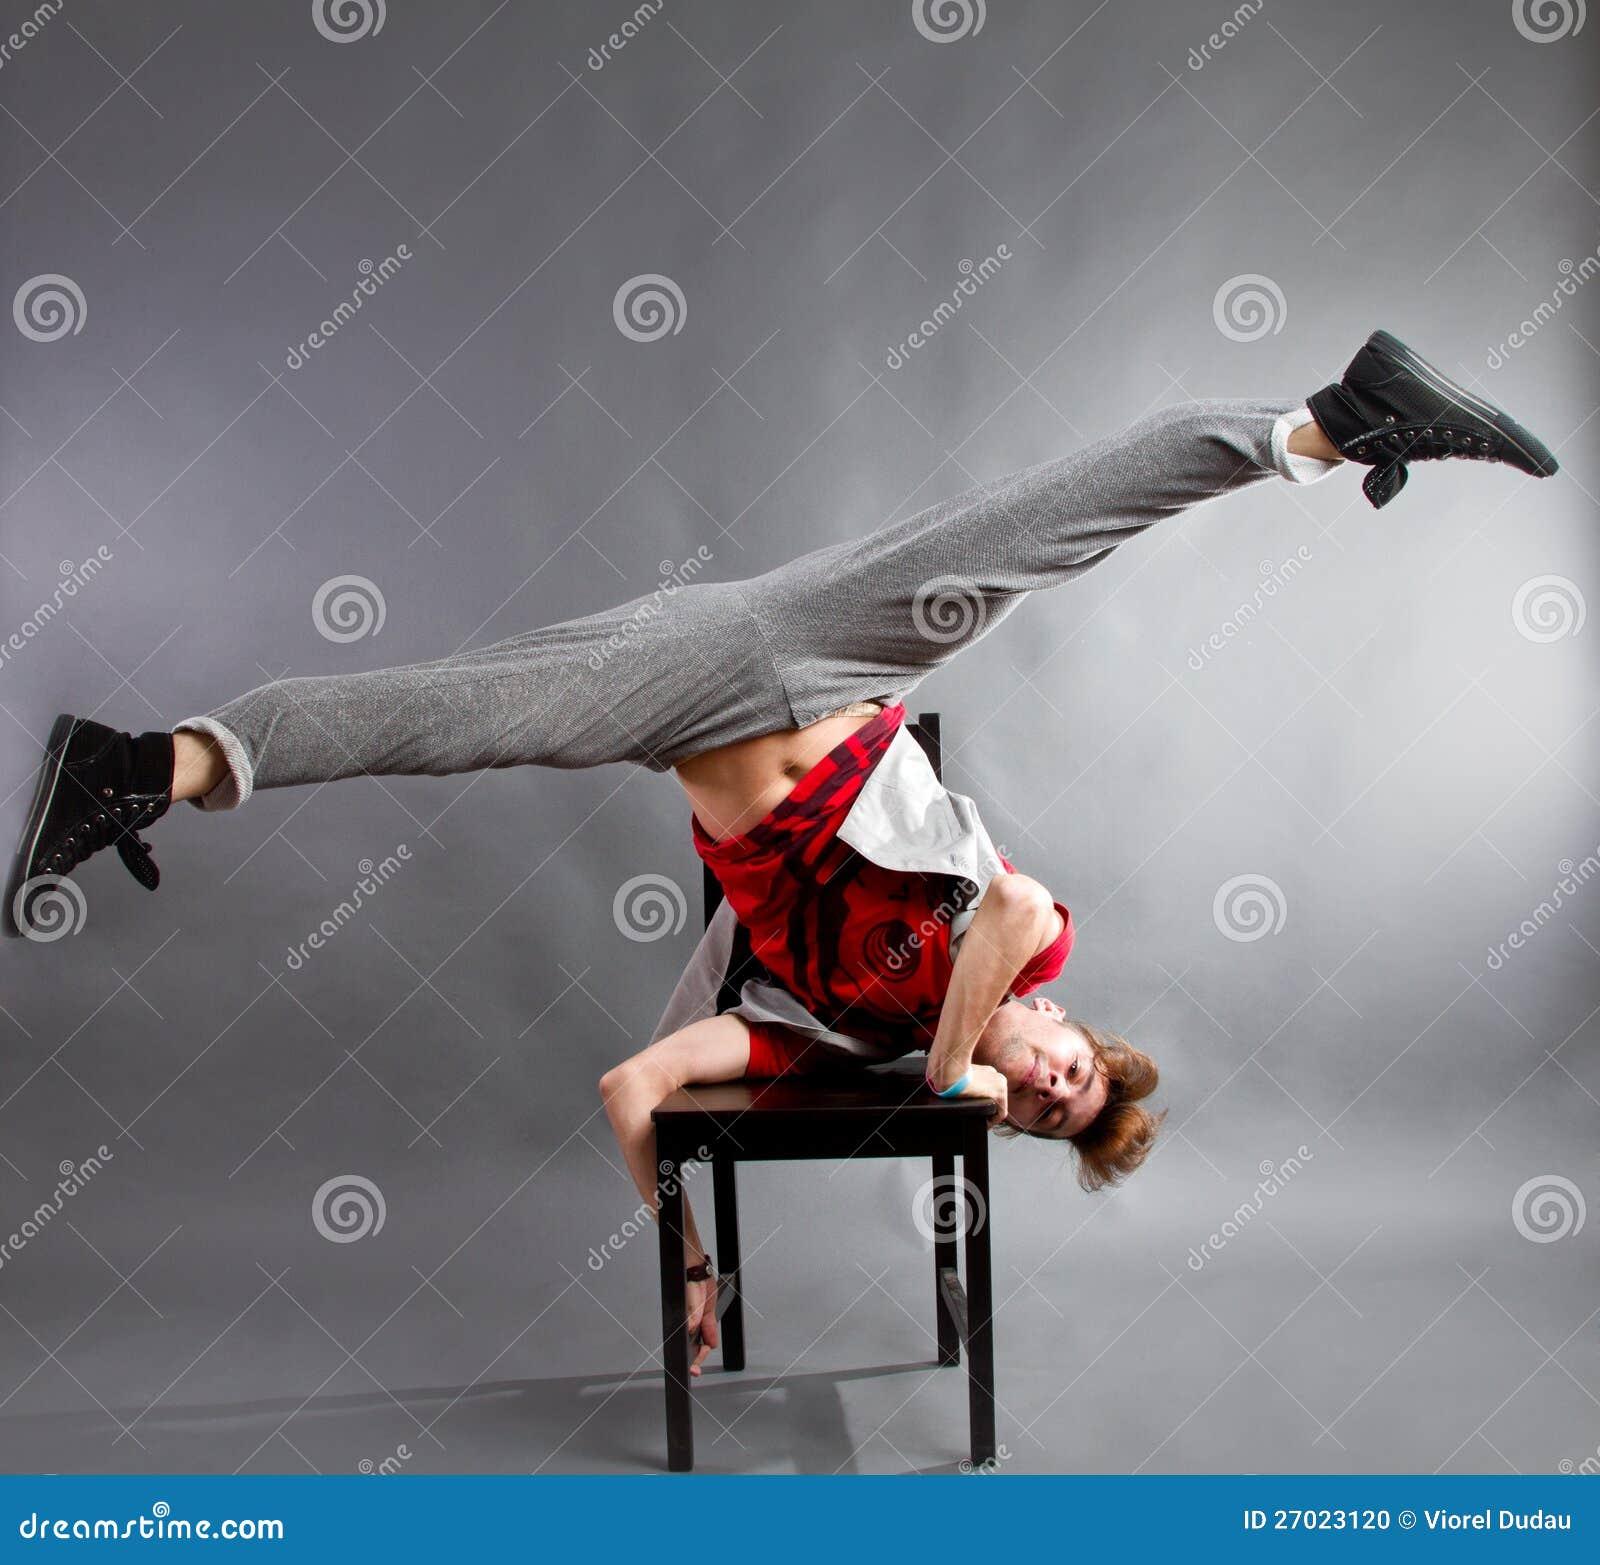 Man dancing on chair